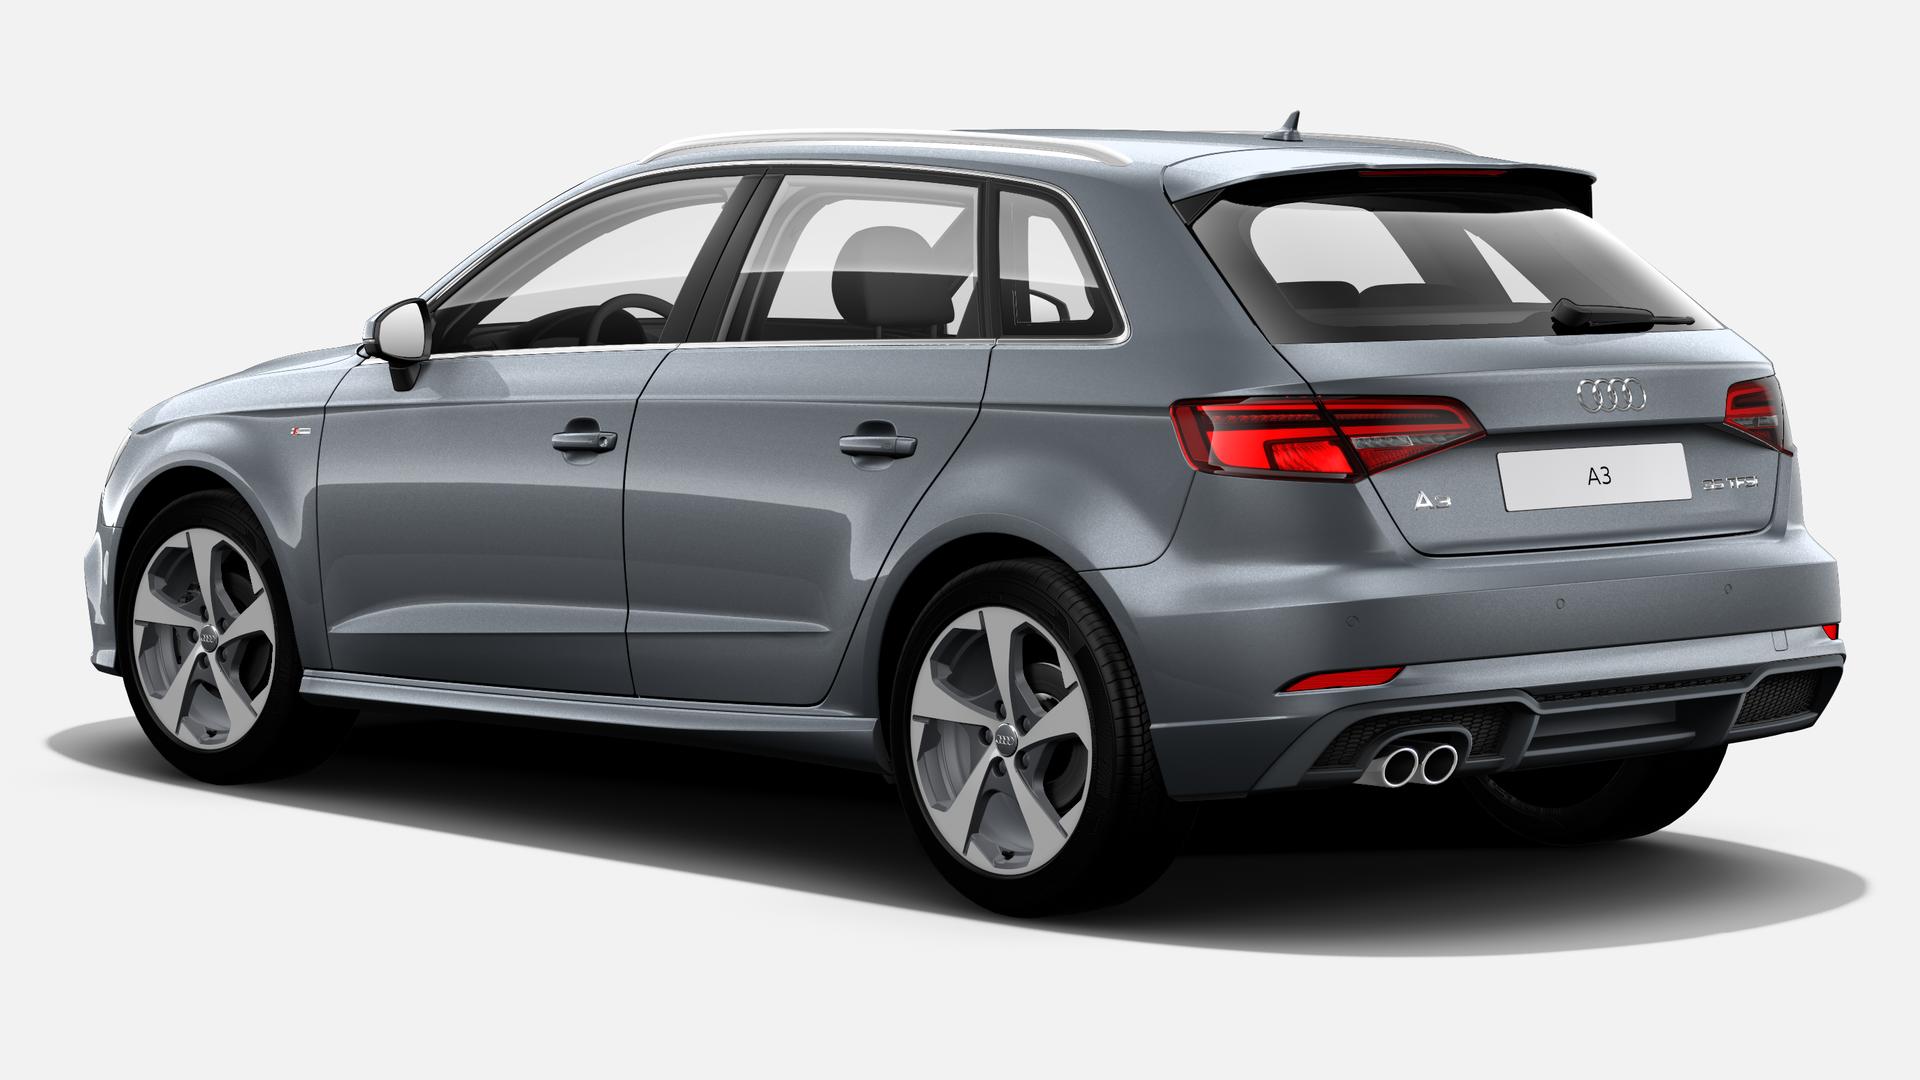 Vista Tres cuartos trasera izquierda de Audi A3 Sportback 35 TFSI CoD S line 110 kW (150 CV)